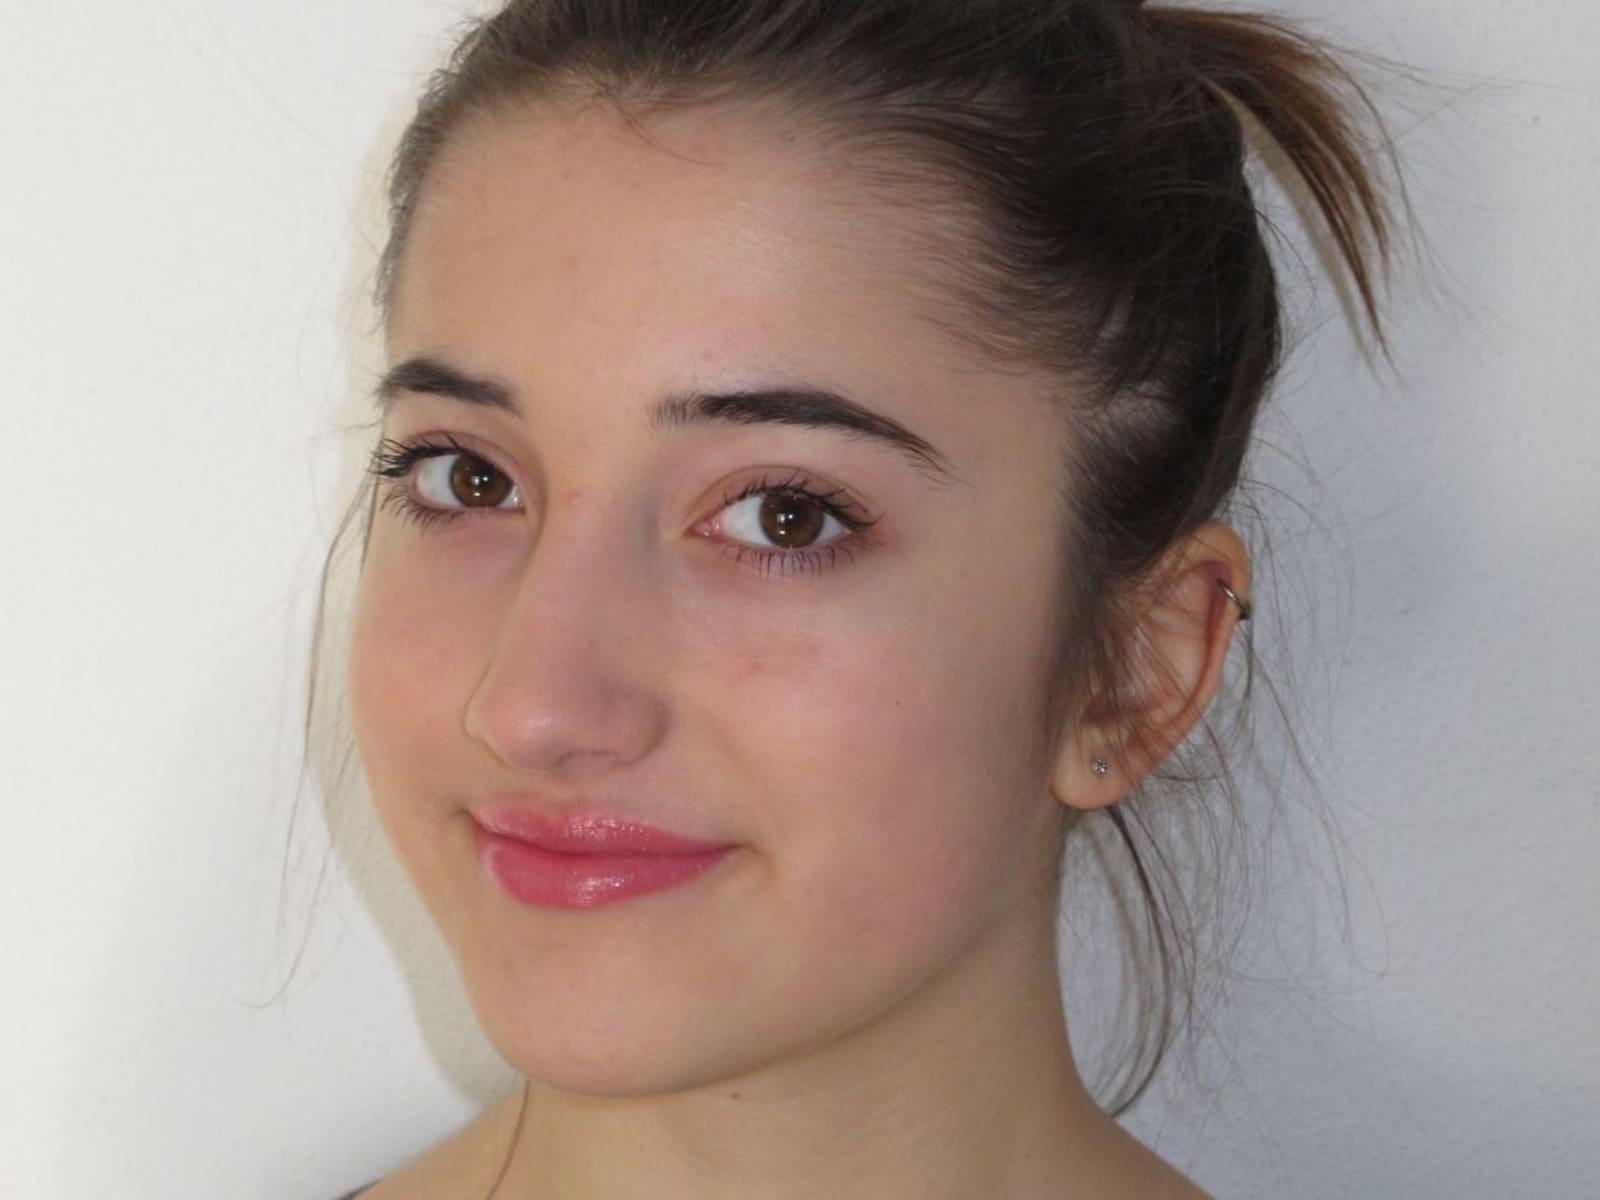 Katharina from Ingolstadt, Germany